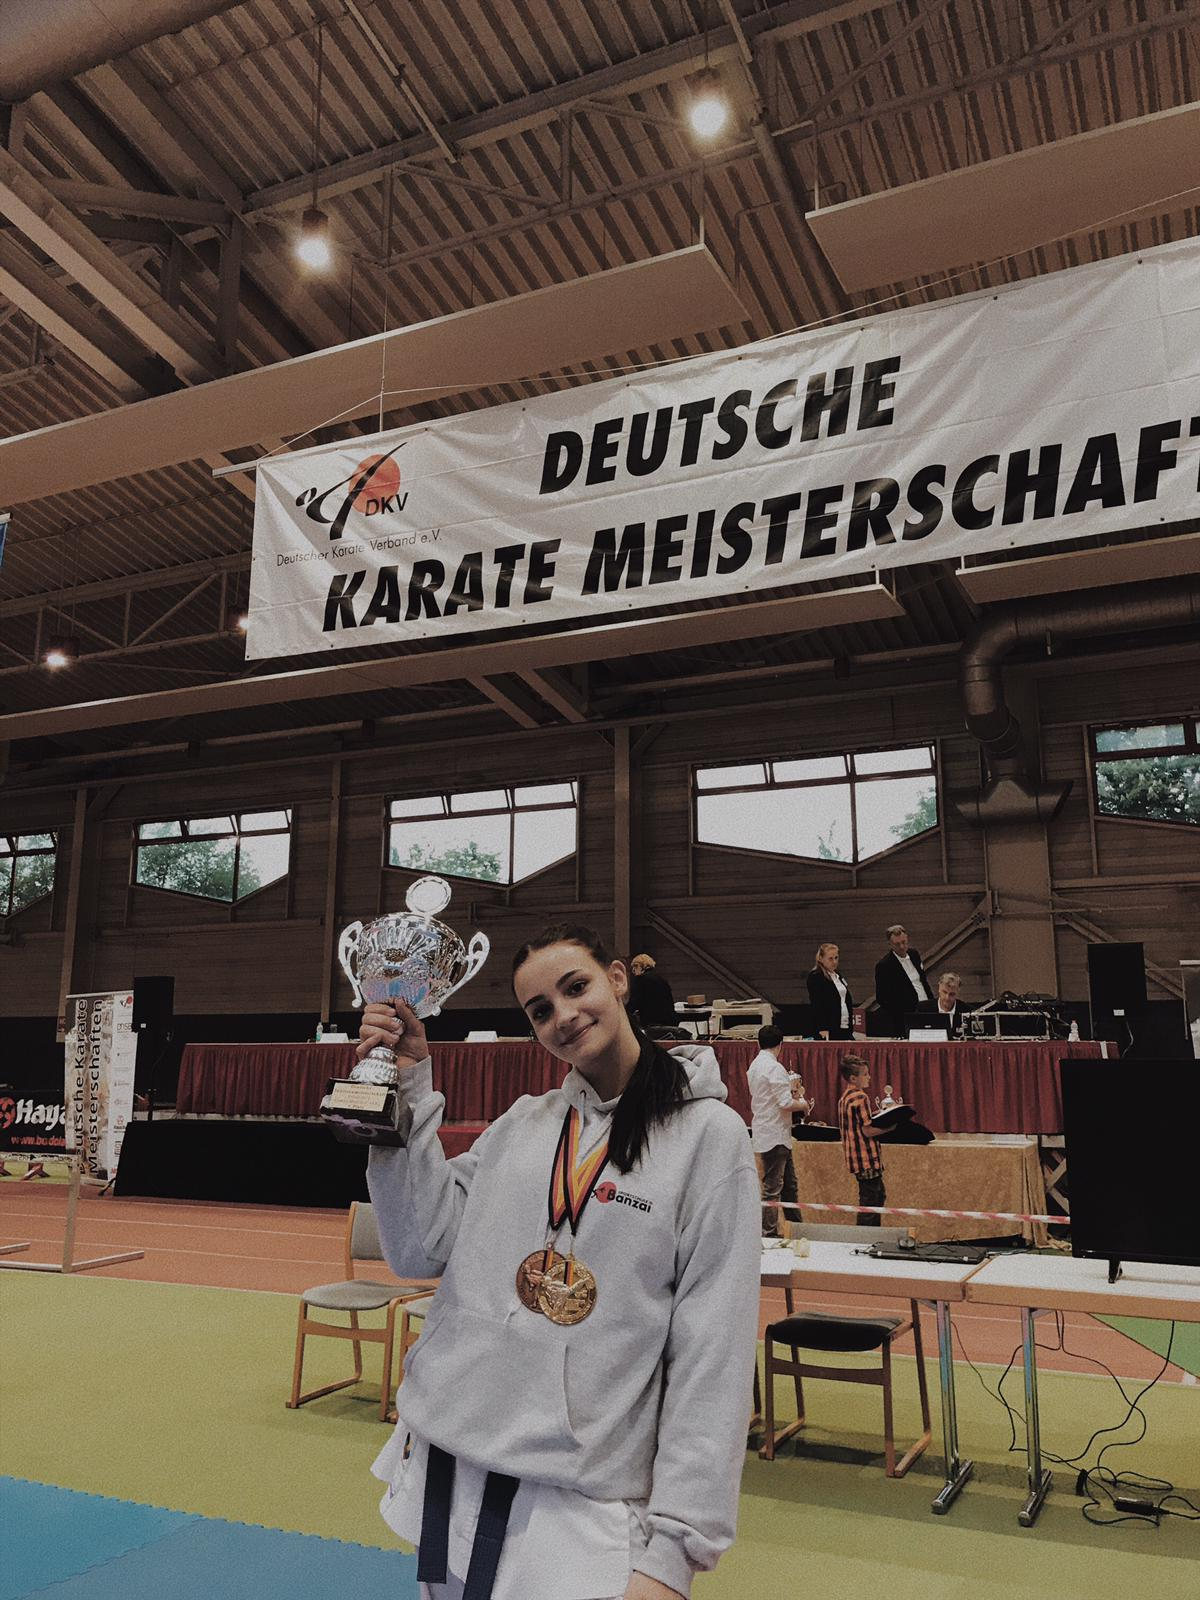 Verdient mit DM-Pokal: Charleene Tsoucalas